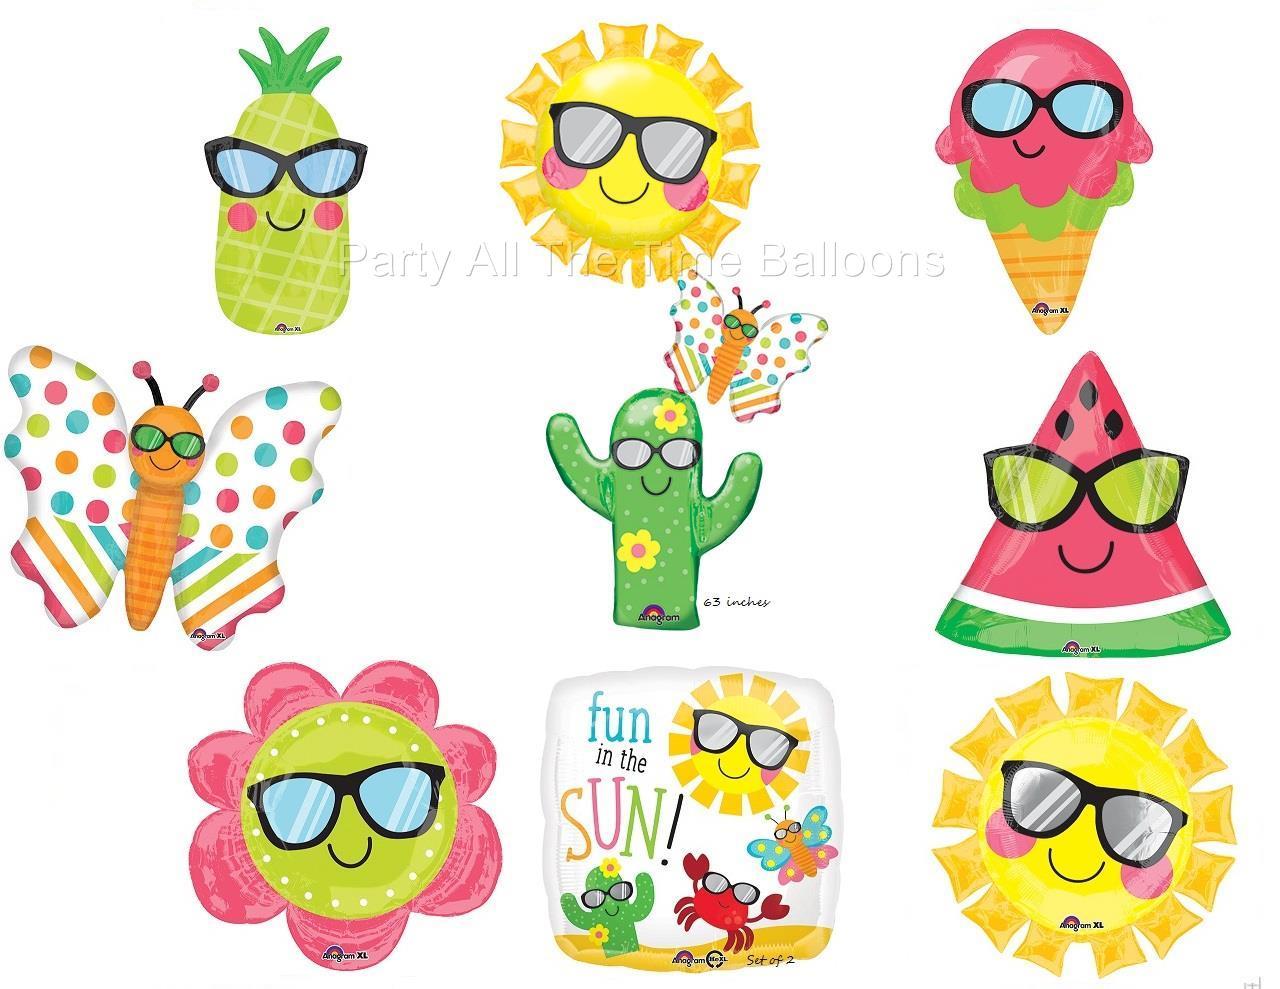 fun in the sun balloons ur choice sunglasses icecream fruit fun pool